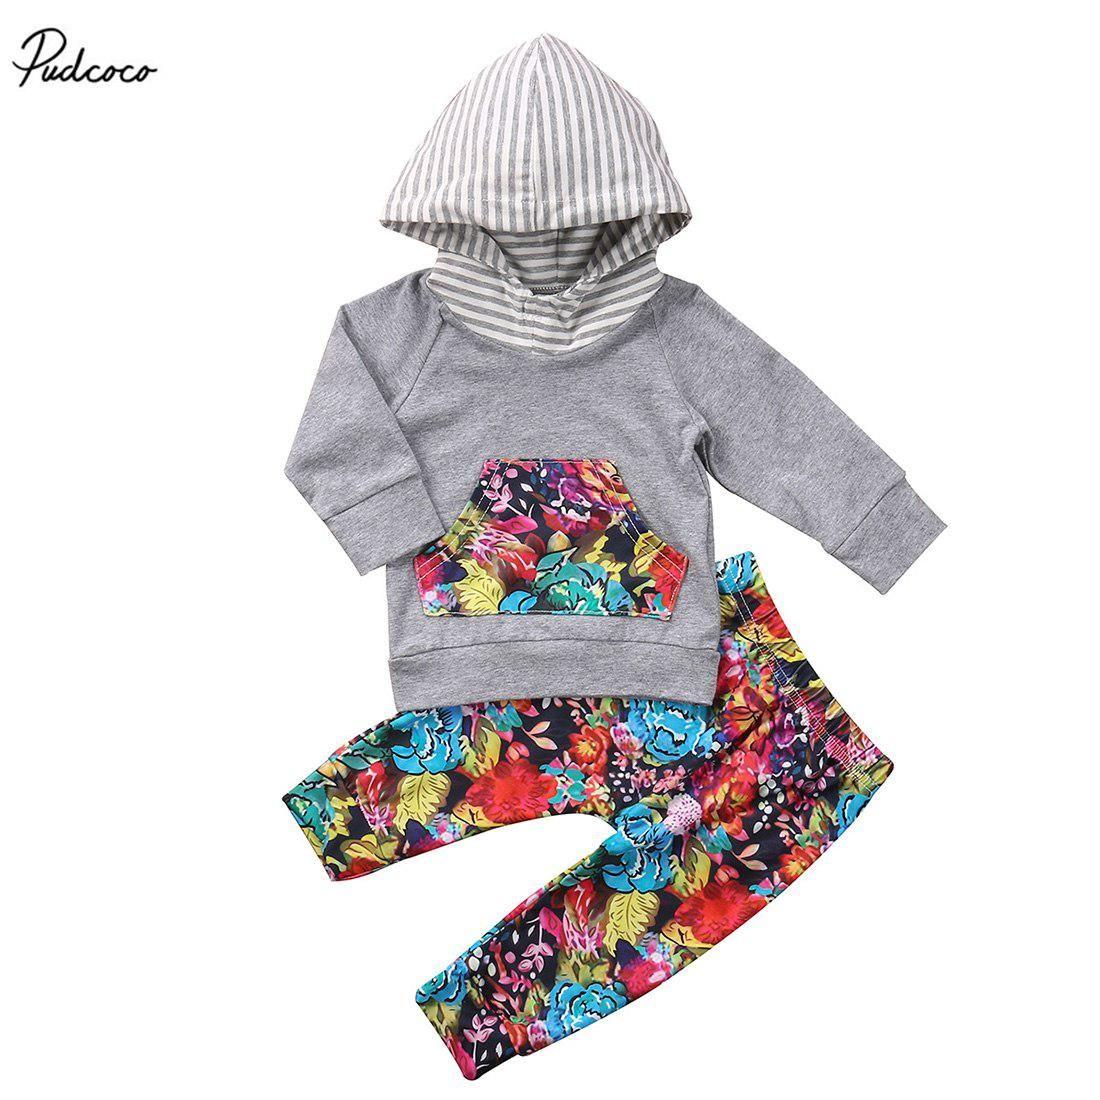 7363ef8fc 2Pcs Newborn Kids Baby Boys Girls Striped Hooded Long Sleeve Floral ...